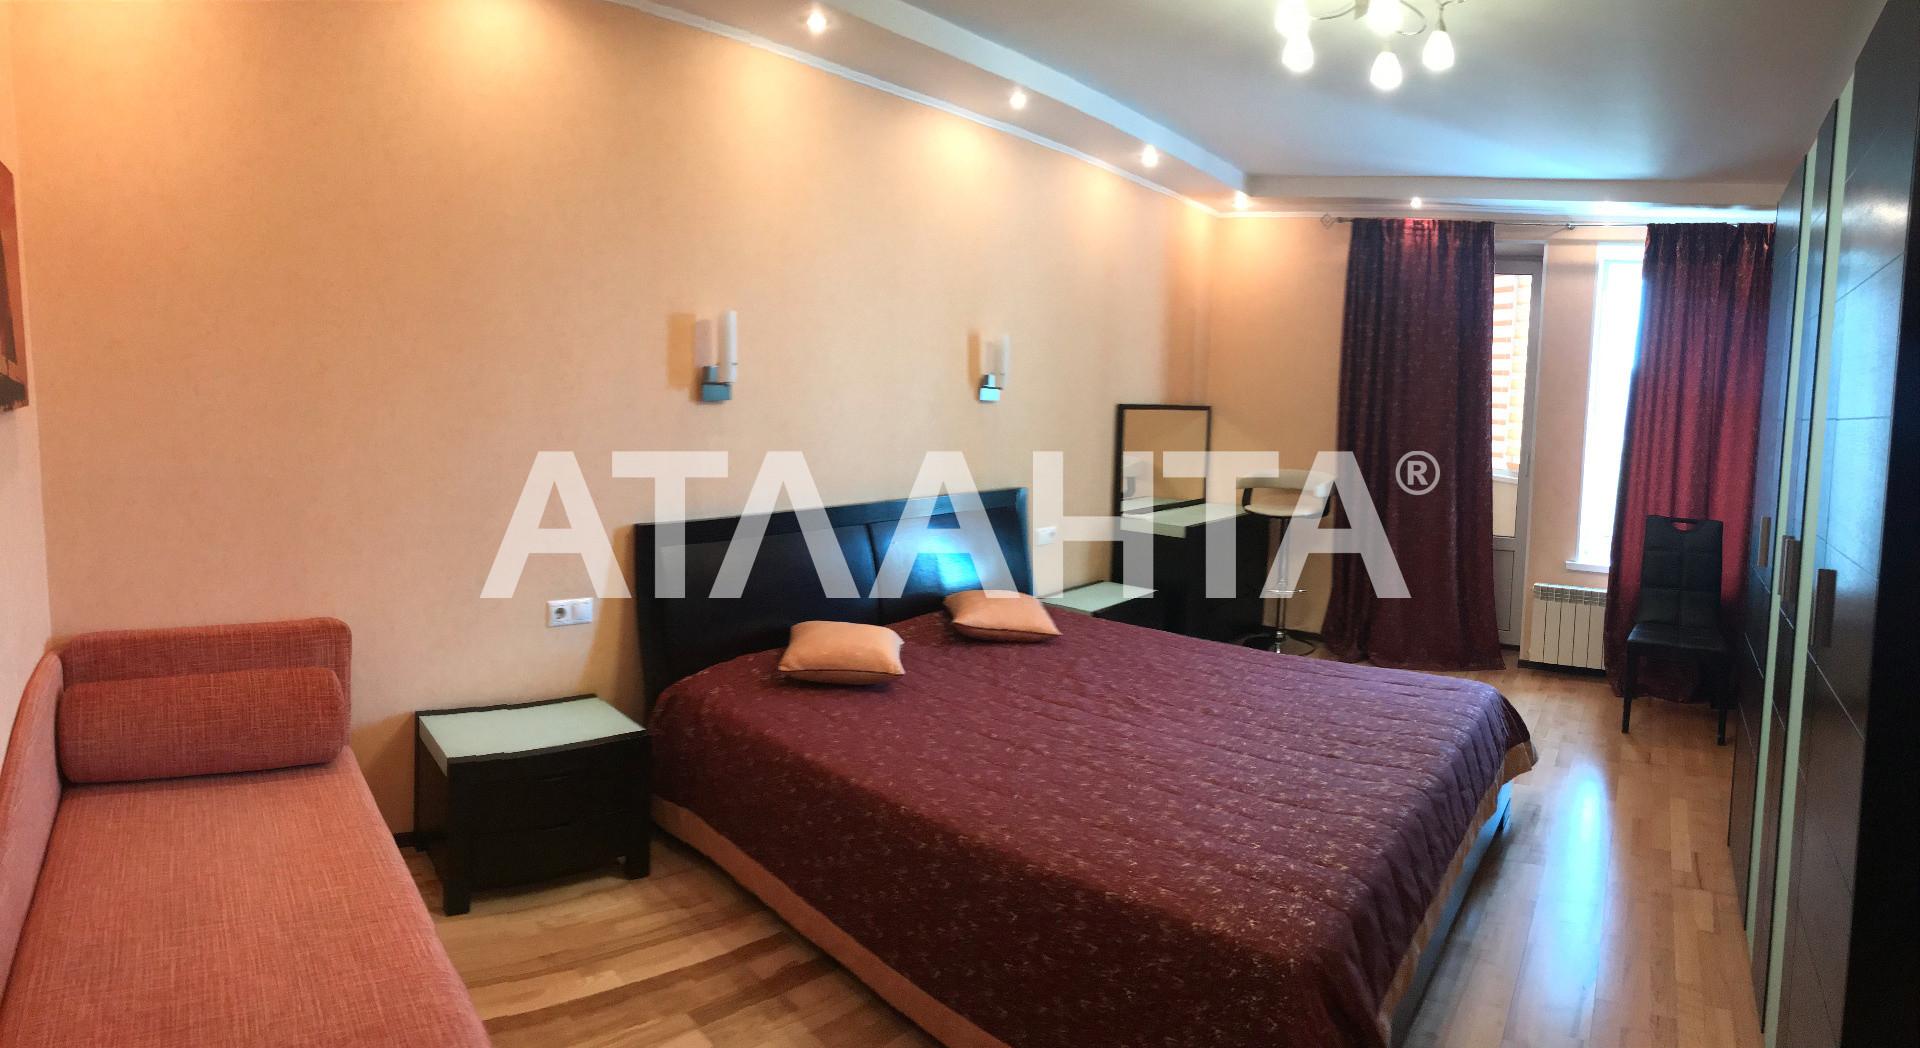 Продается 3-комнатная Квартира на ул. Ул. Ломоносова — 135 000 у.е. (фото №13)